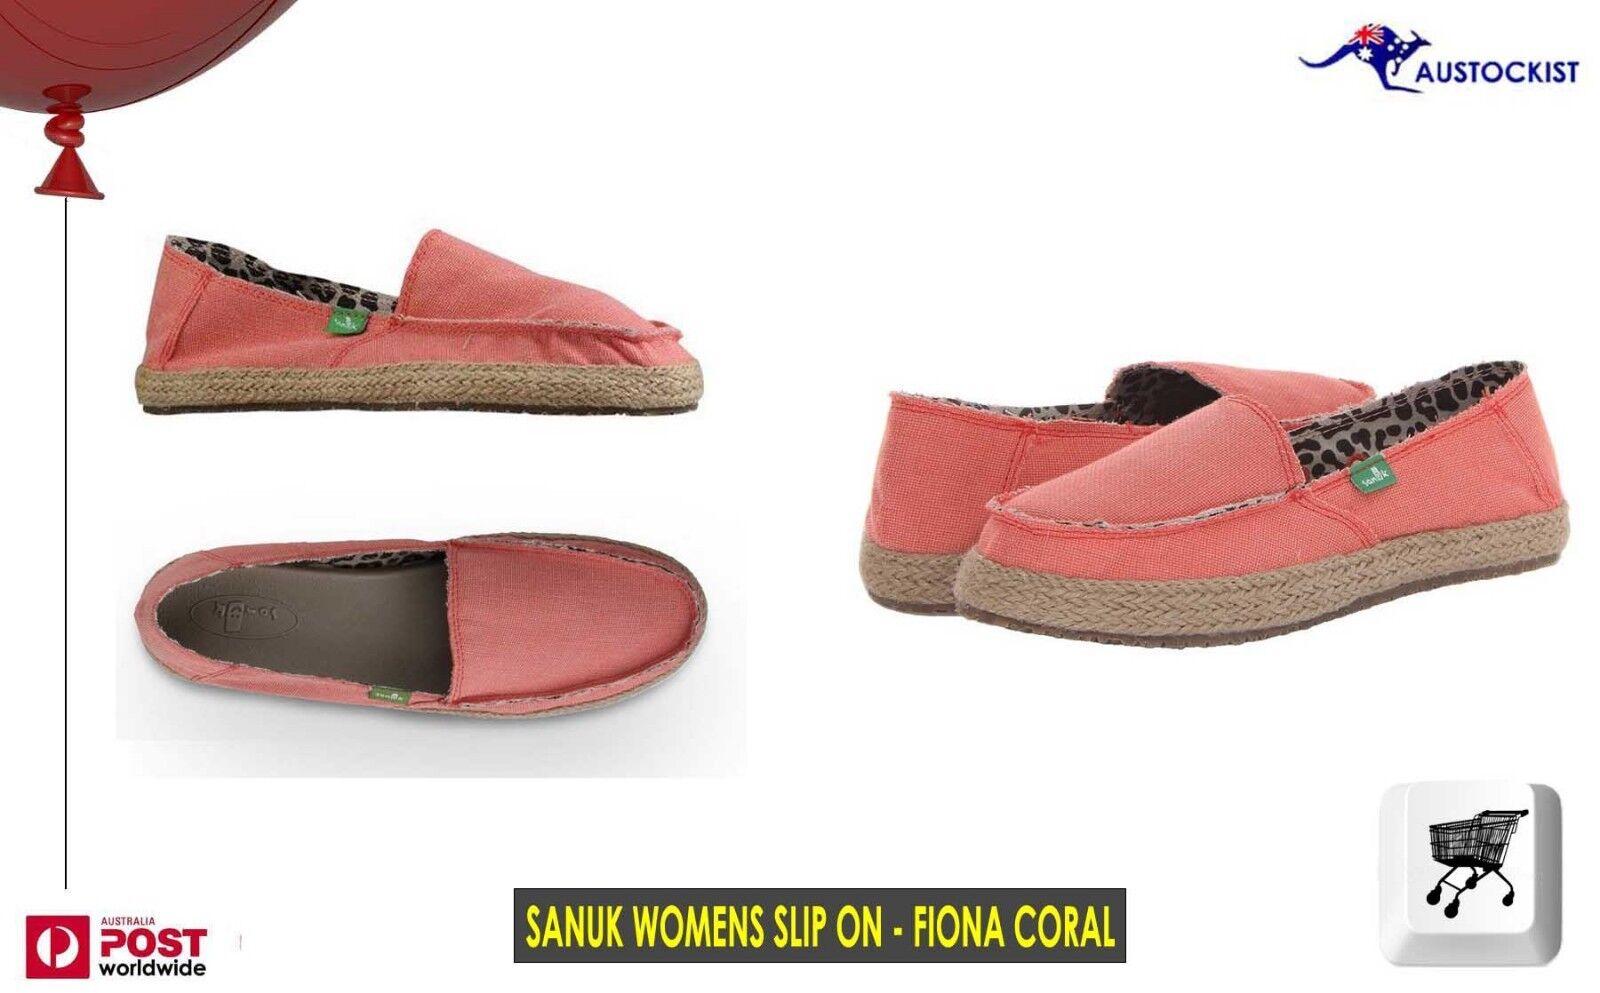 Sanuk Fiona Slip On surfista Sandalia Coral Zapatos Coral Sandalia Talla 8-US 6-UK 39 = UE BNWT 36eae6